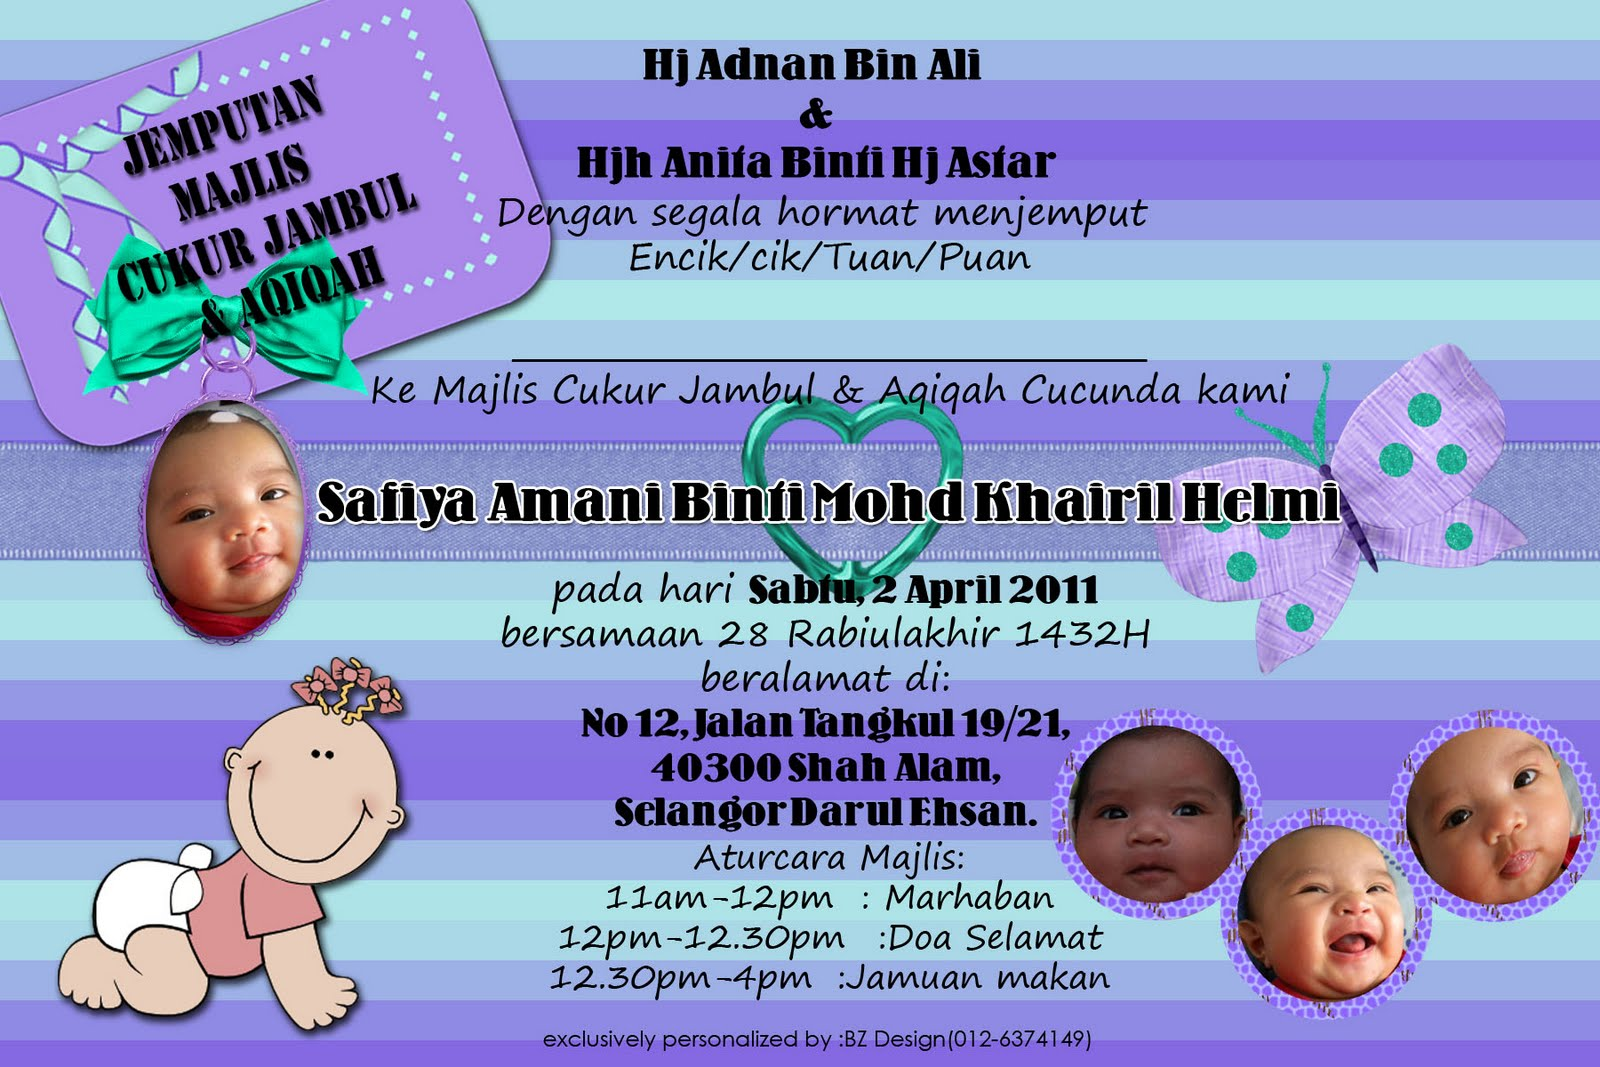 Invitation card - Majlis Akikah.